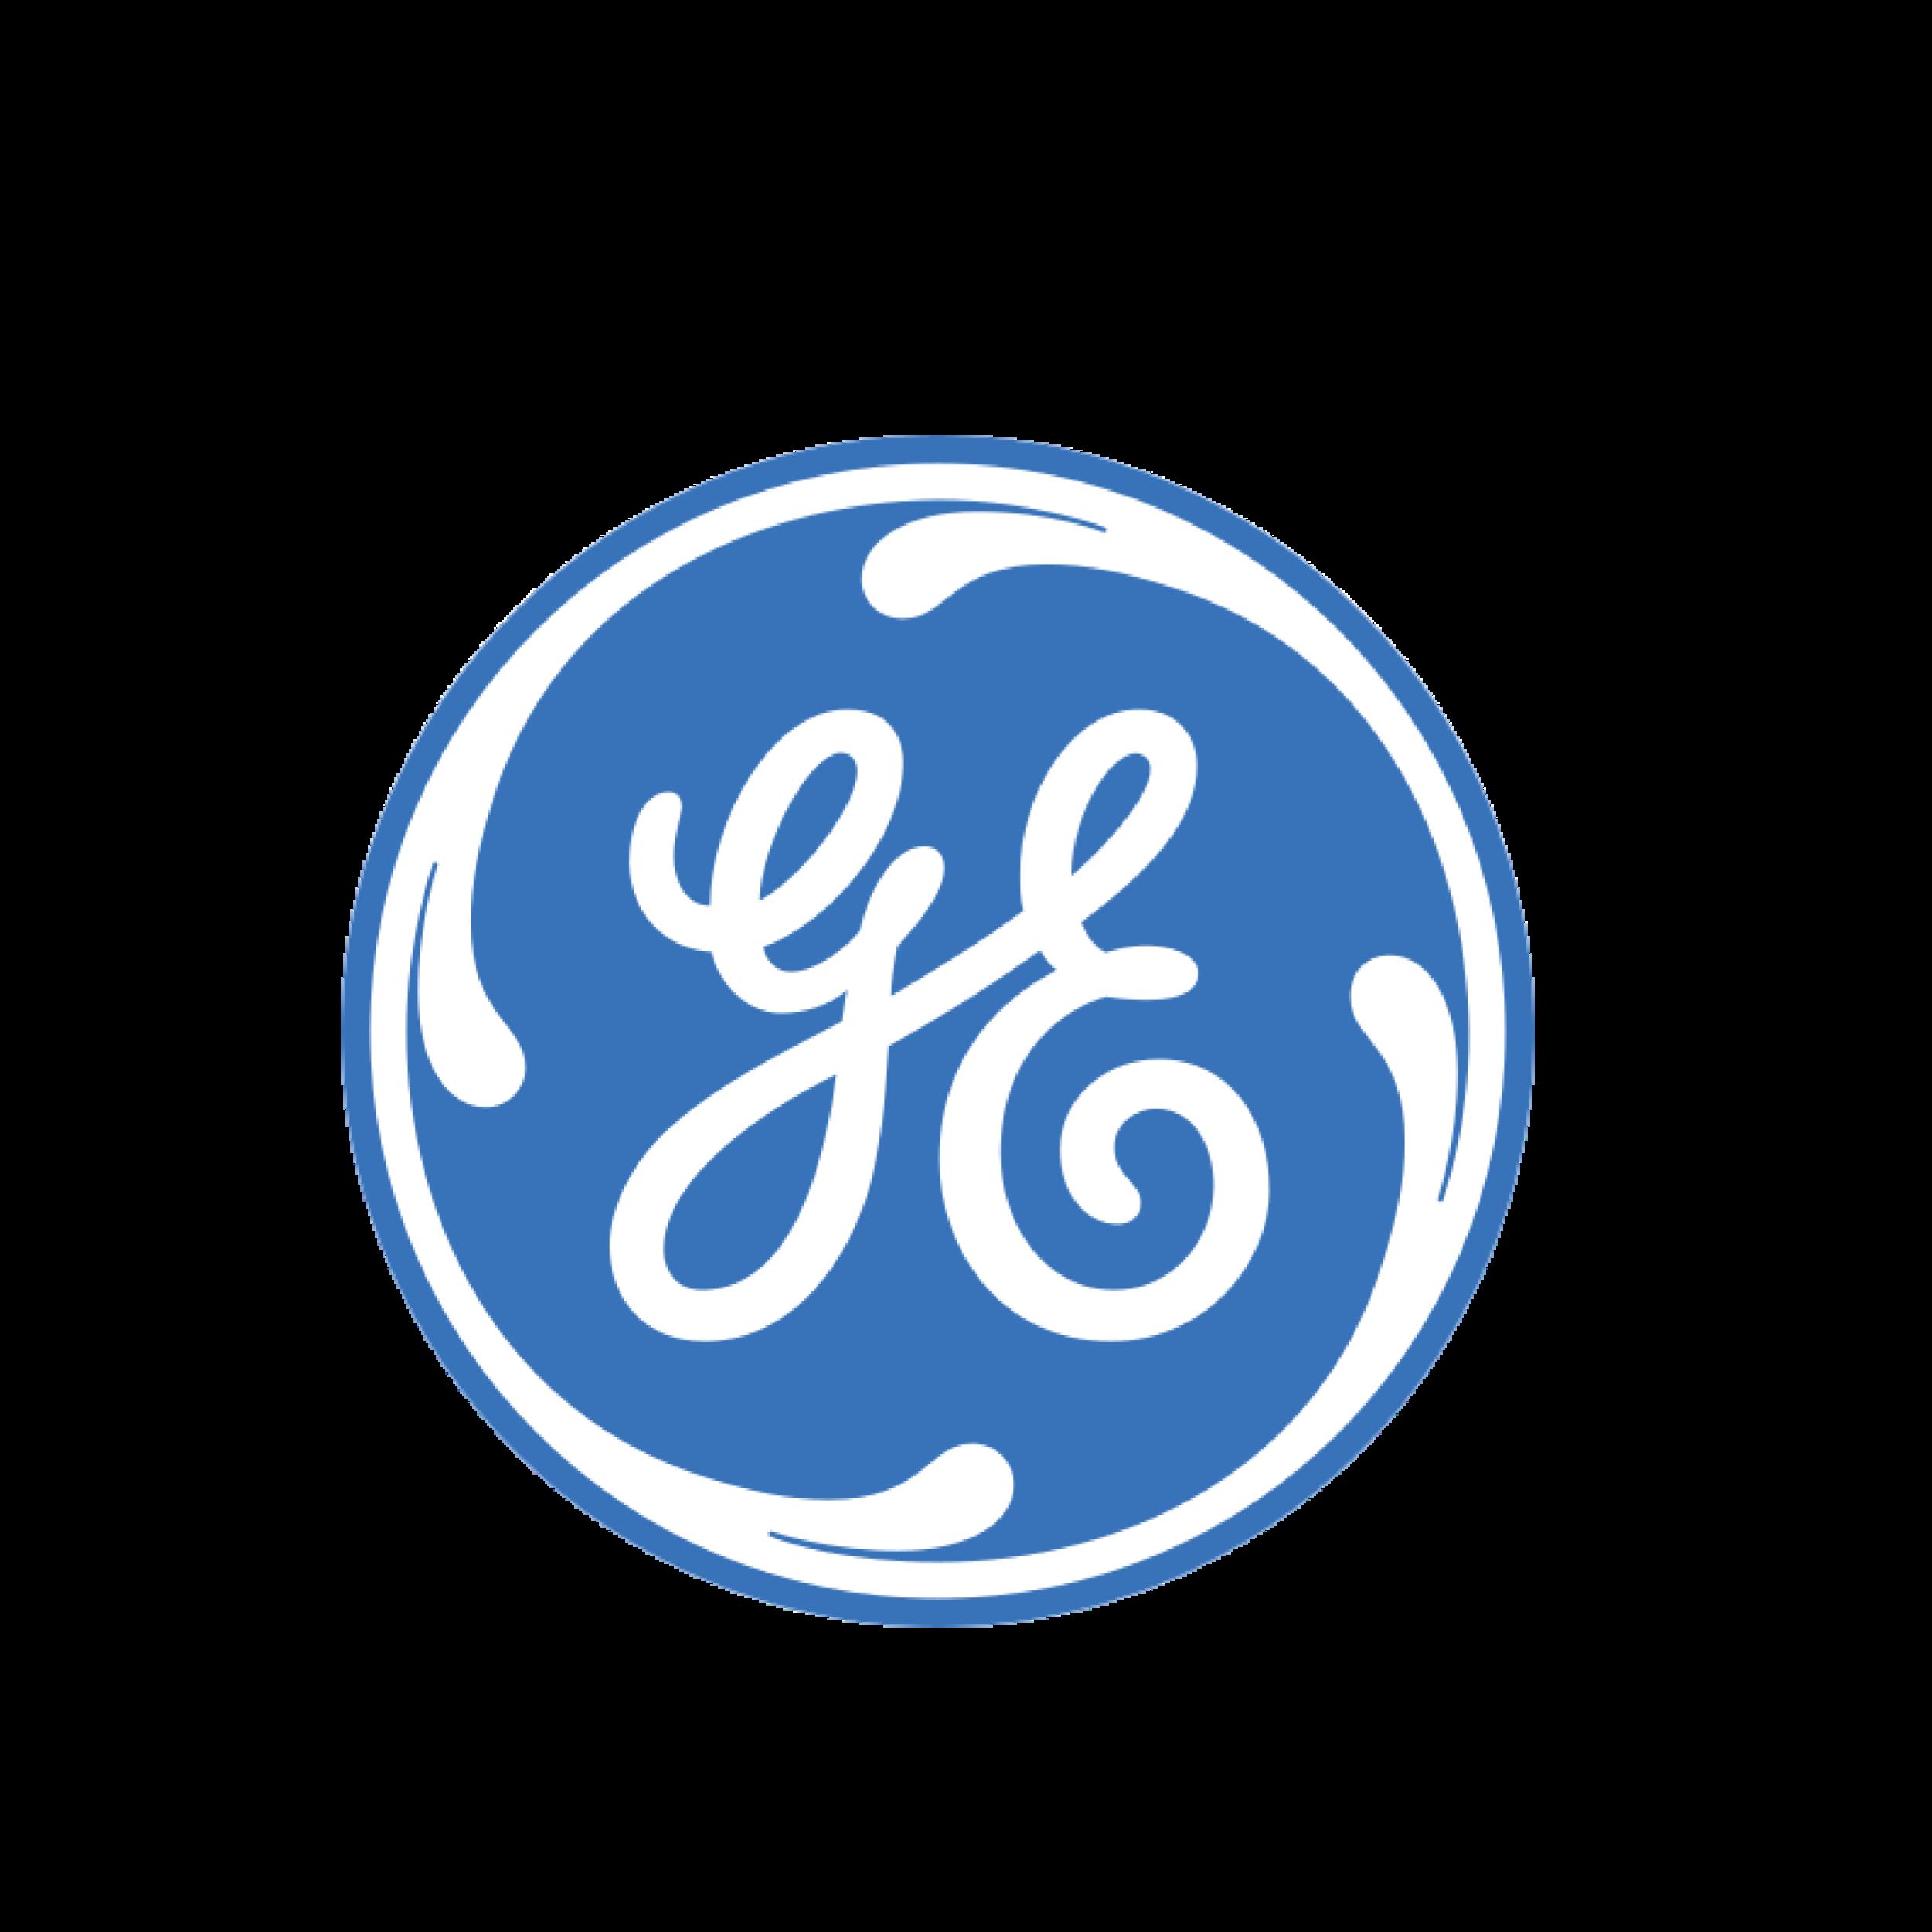 Corporate Logos-11-02.png